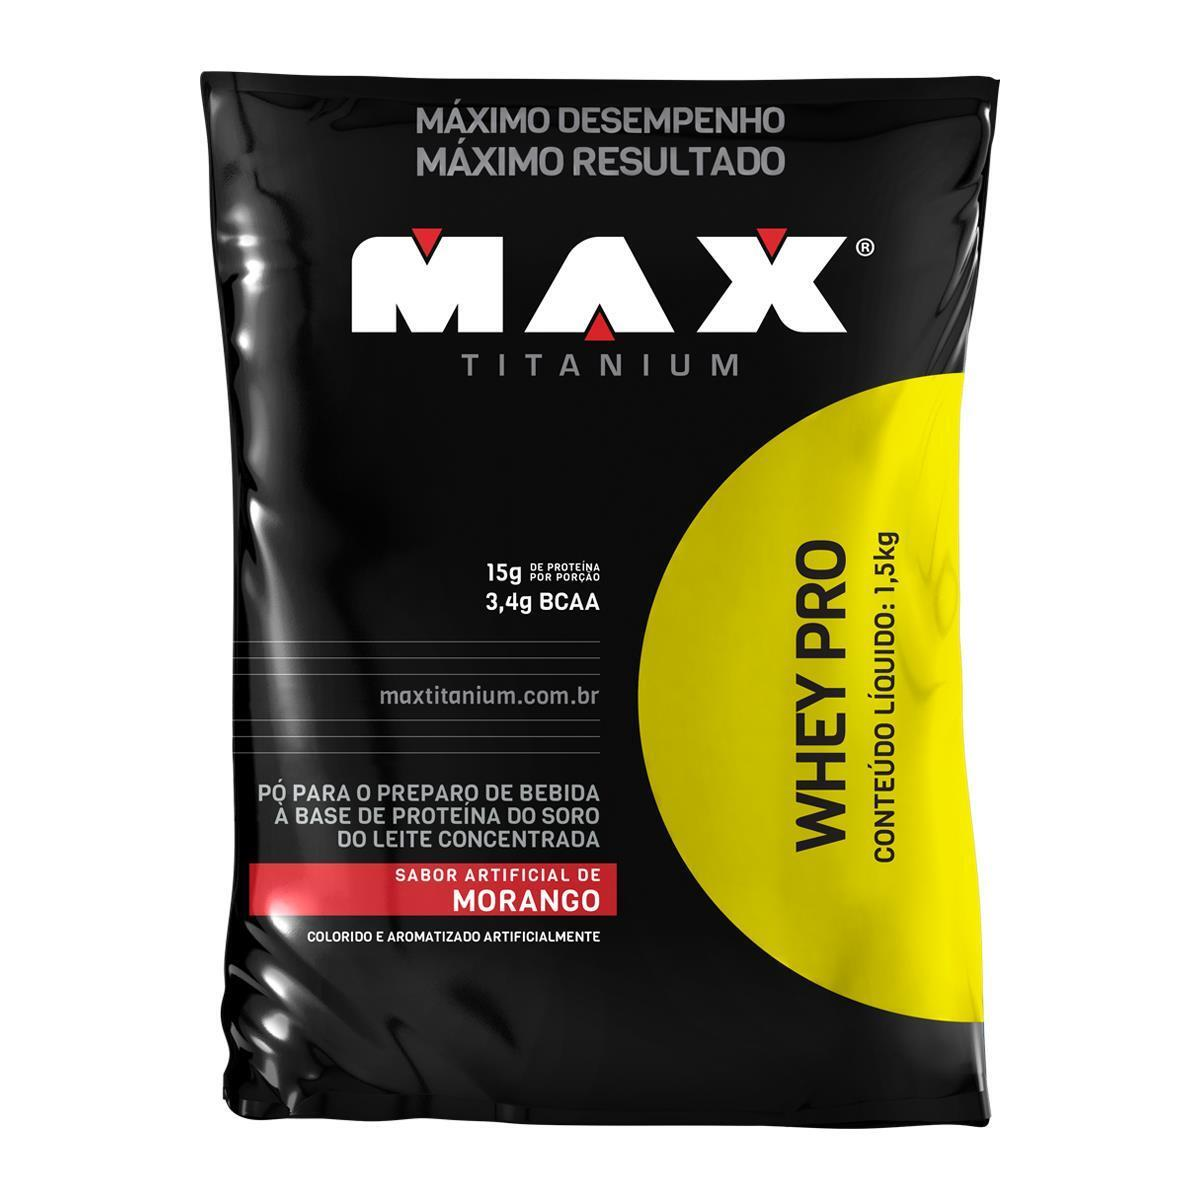 Whey Protein - Pró Max Titanium Refil 1,5Kg